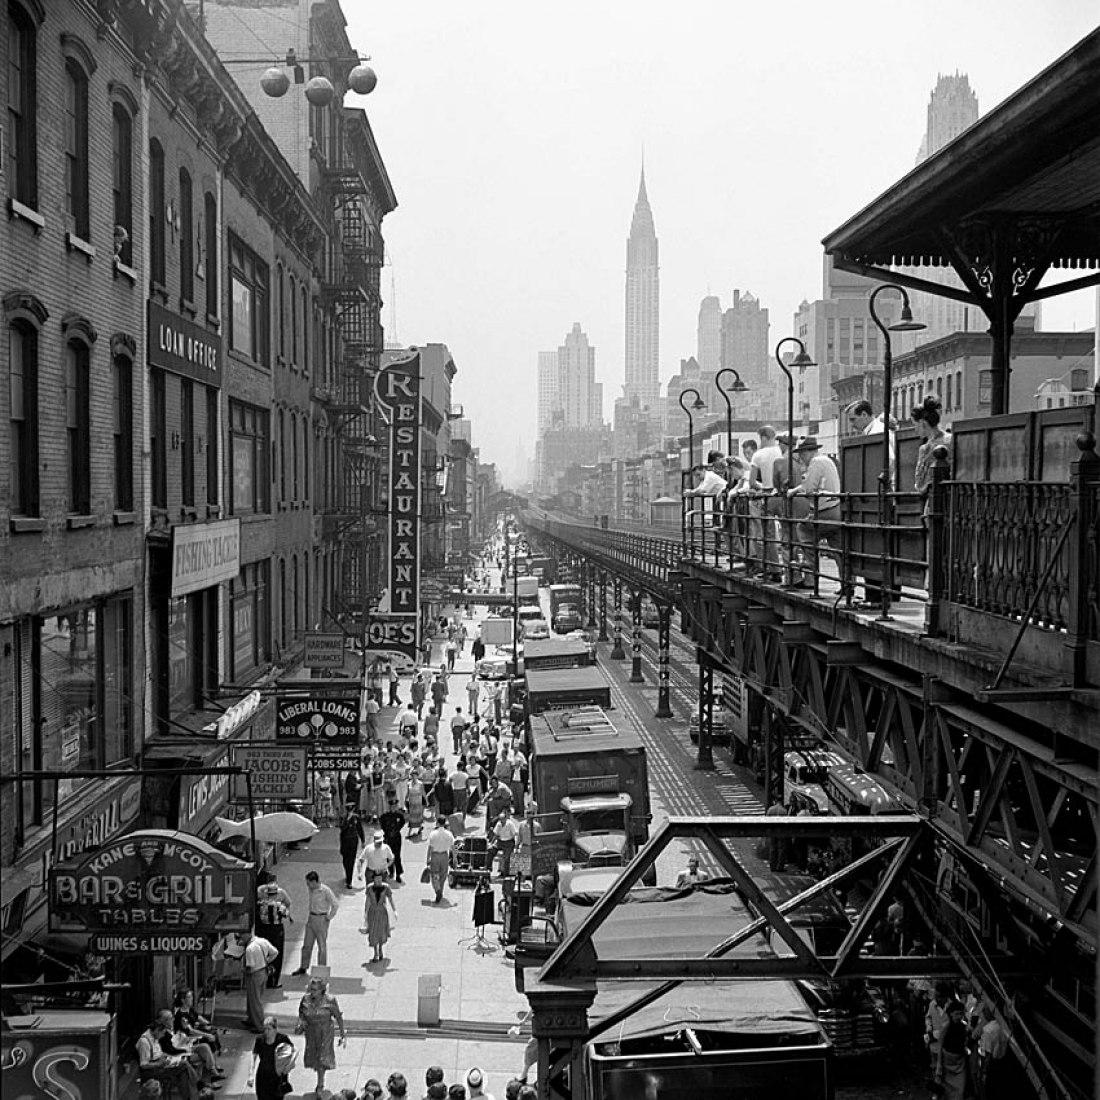 1953, Nueva York, NY. Por Vivian Maier. Cortesía de Álamo Comunicación.